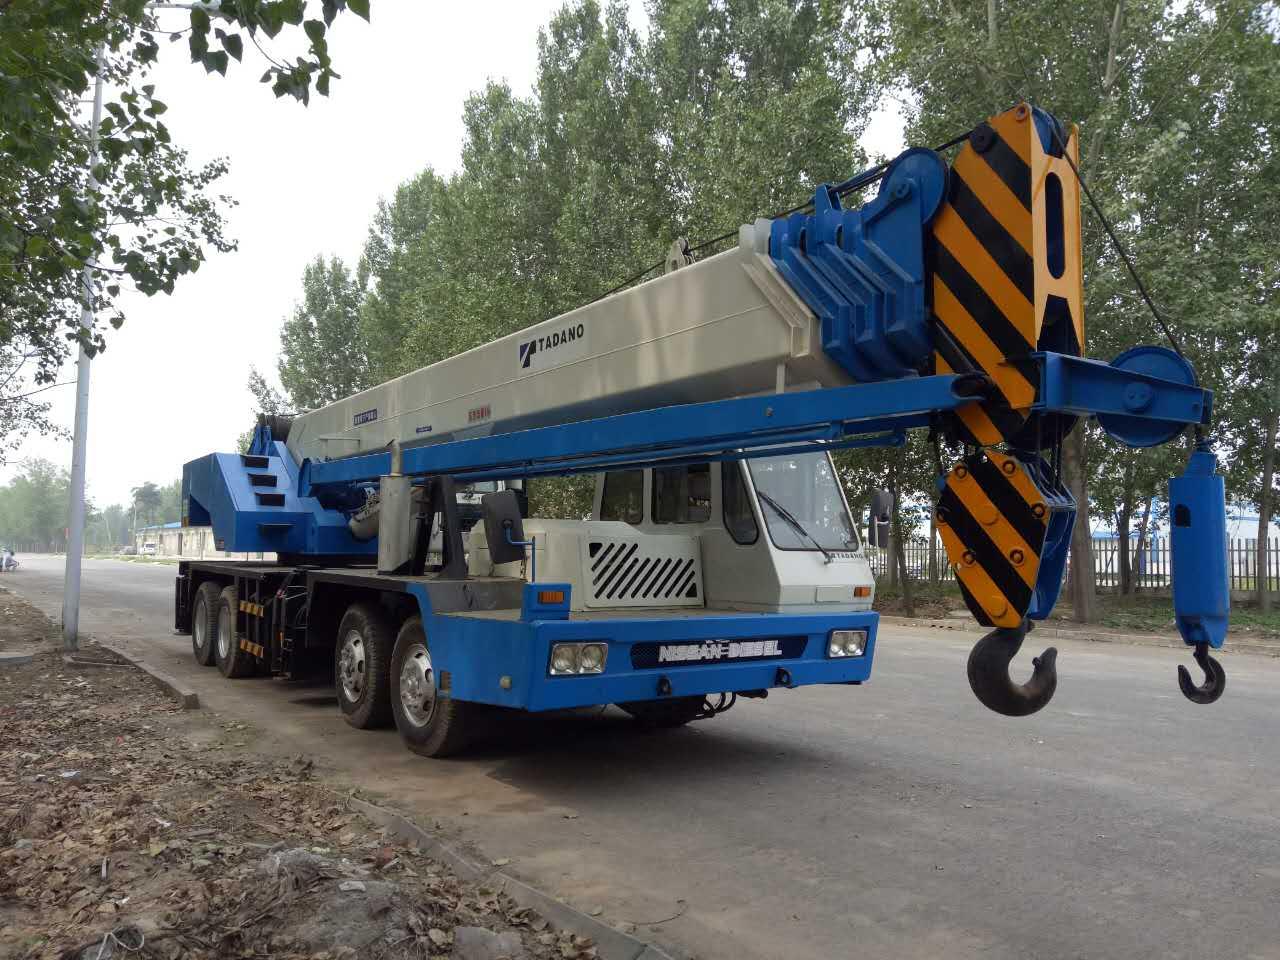 Tadano Crane 65 ton tadano crane GT650EX used truck crane